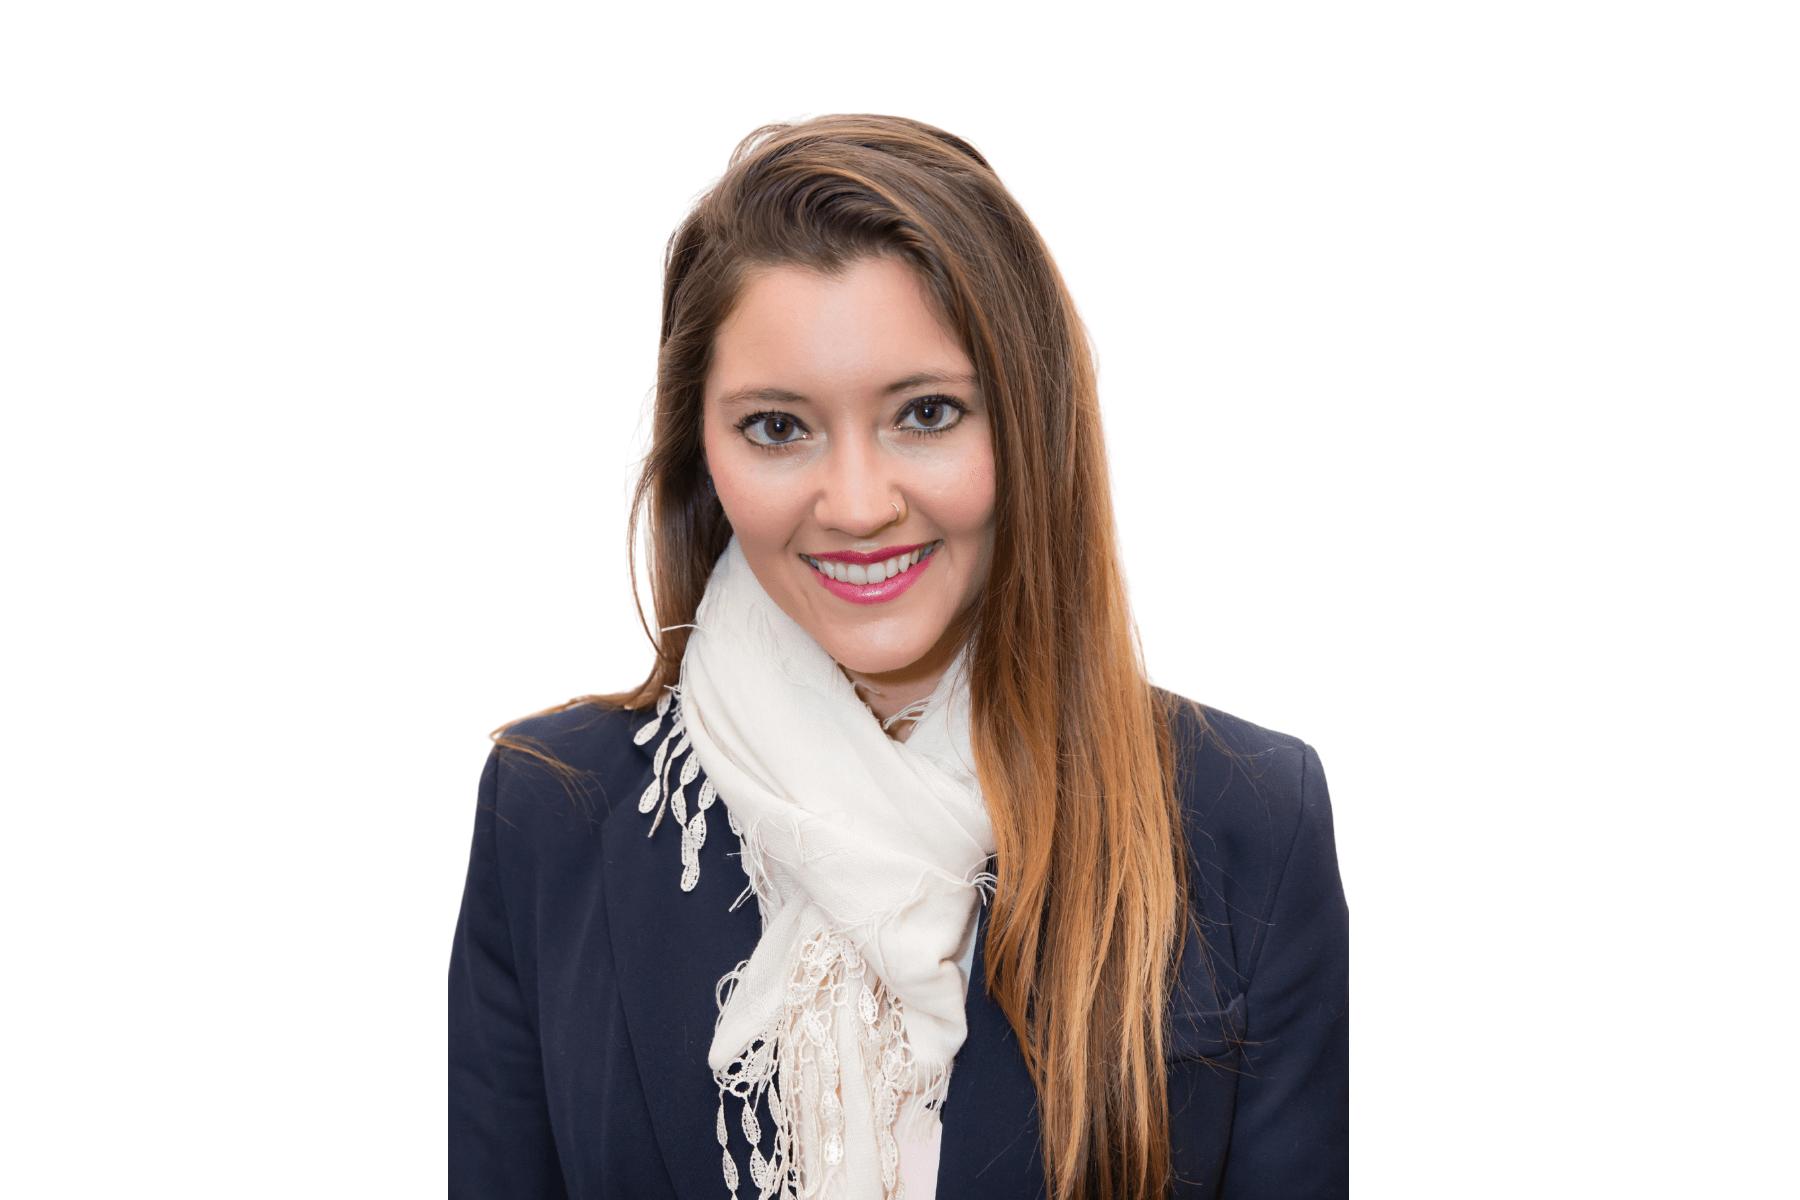 Lindsay Korman - Analyst at Commonwealth RA